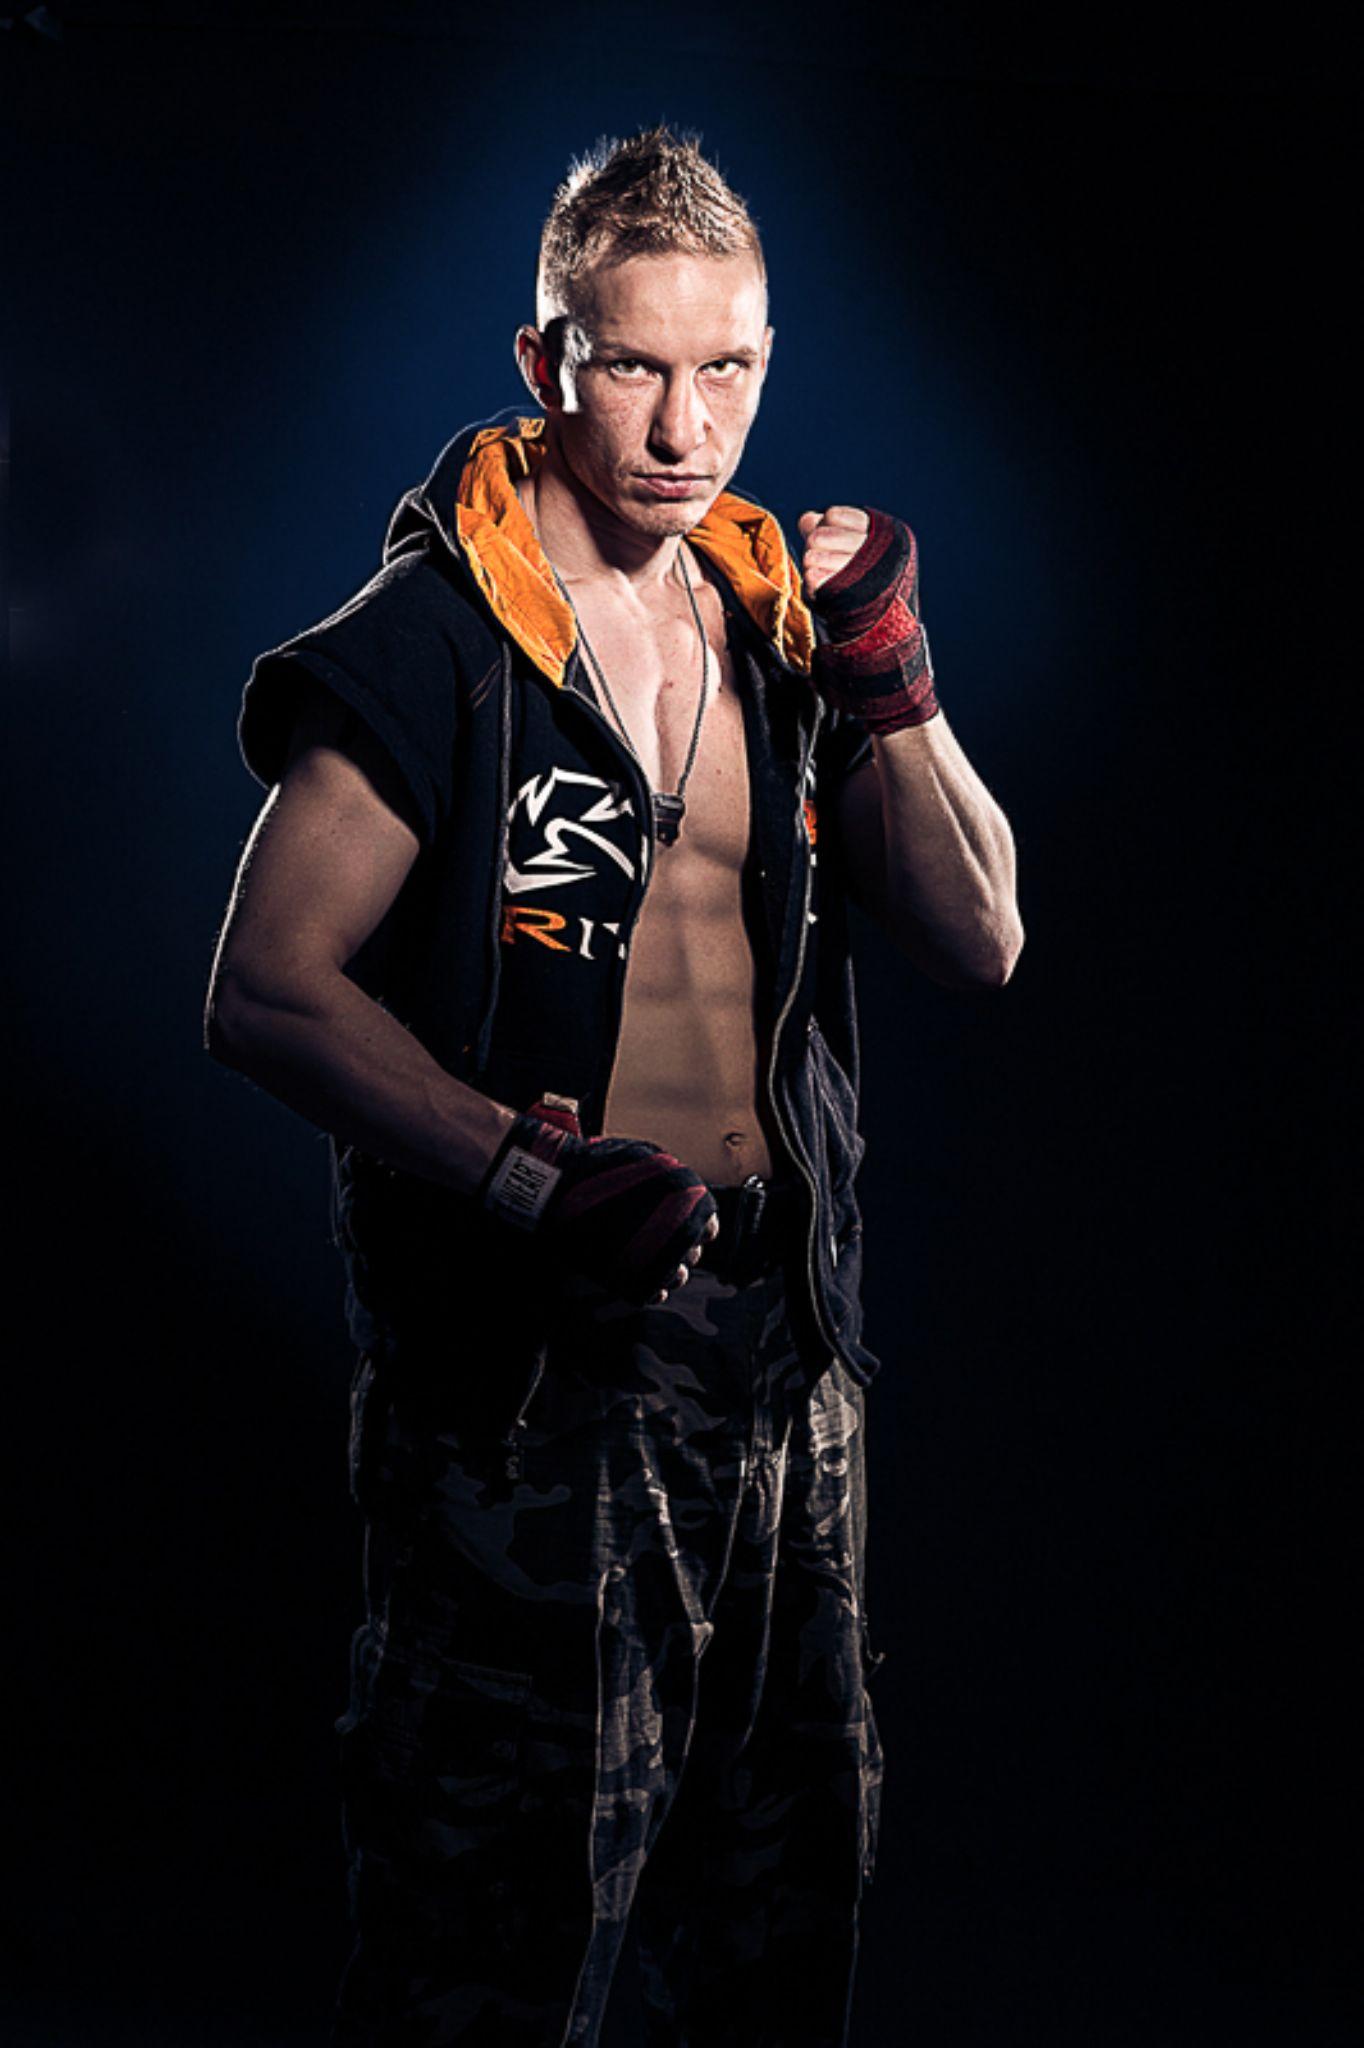 Boxer by Jan-Peter Palmunen